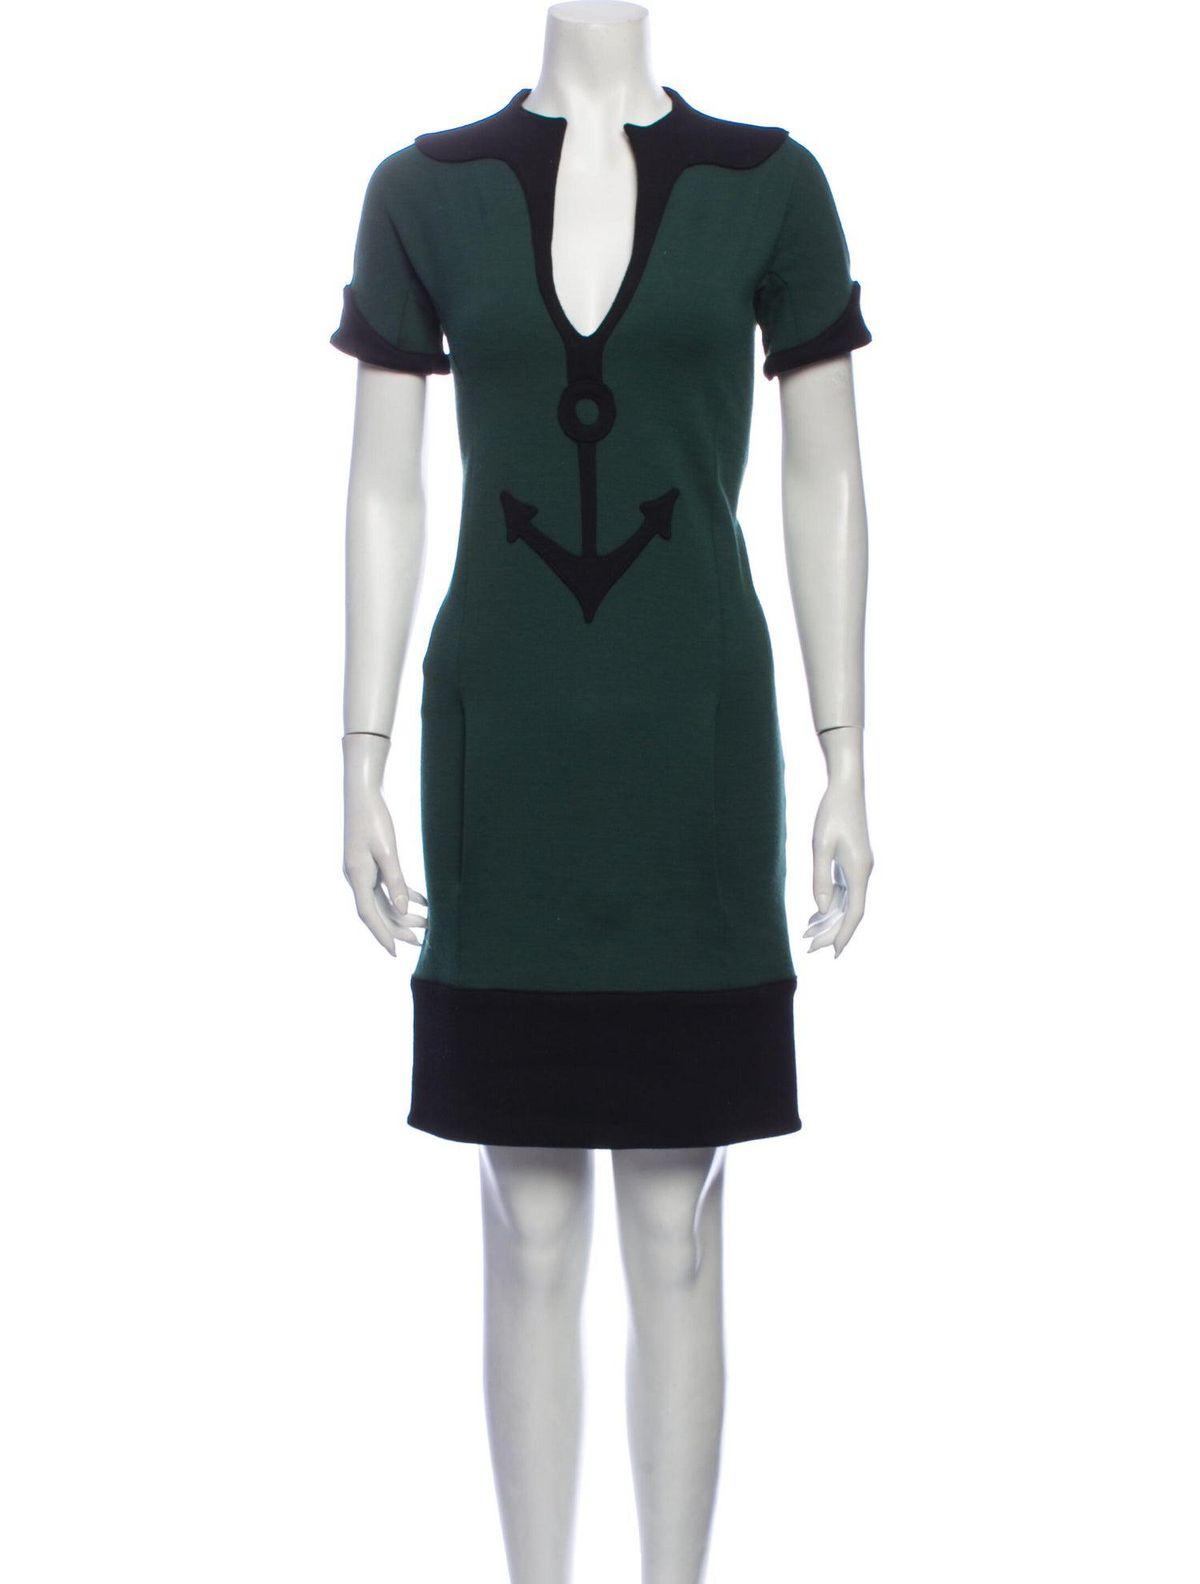 balenciaga patterned mini dress